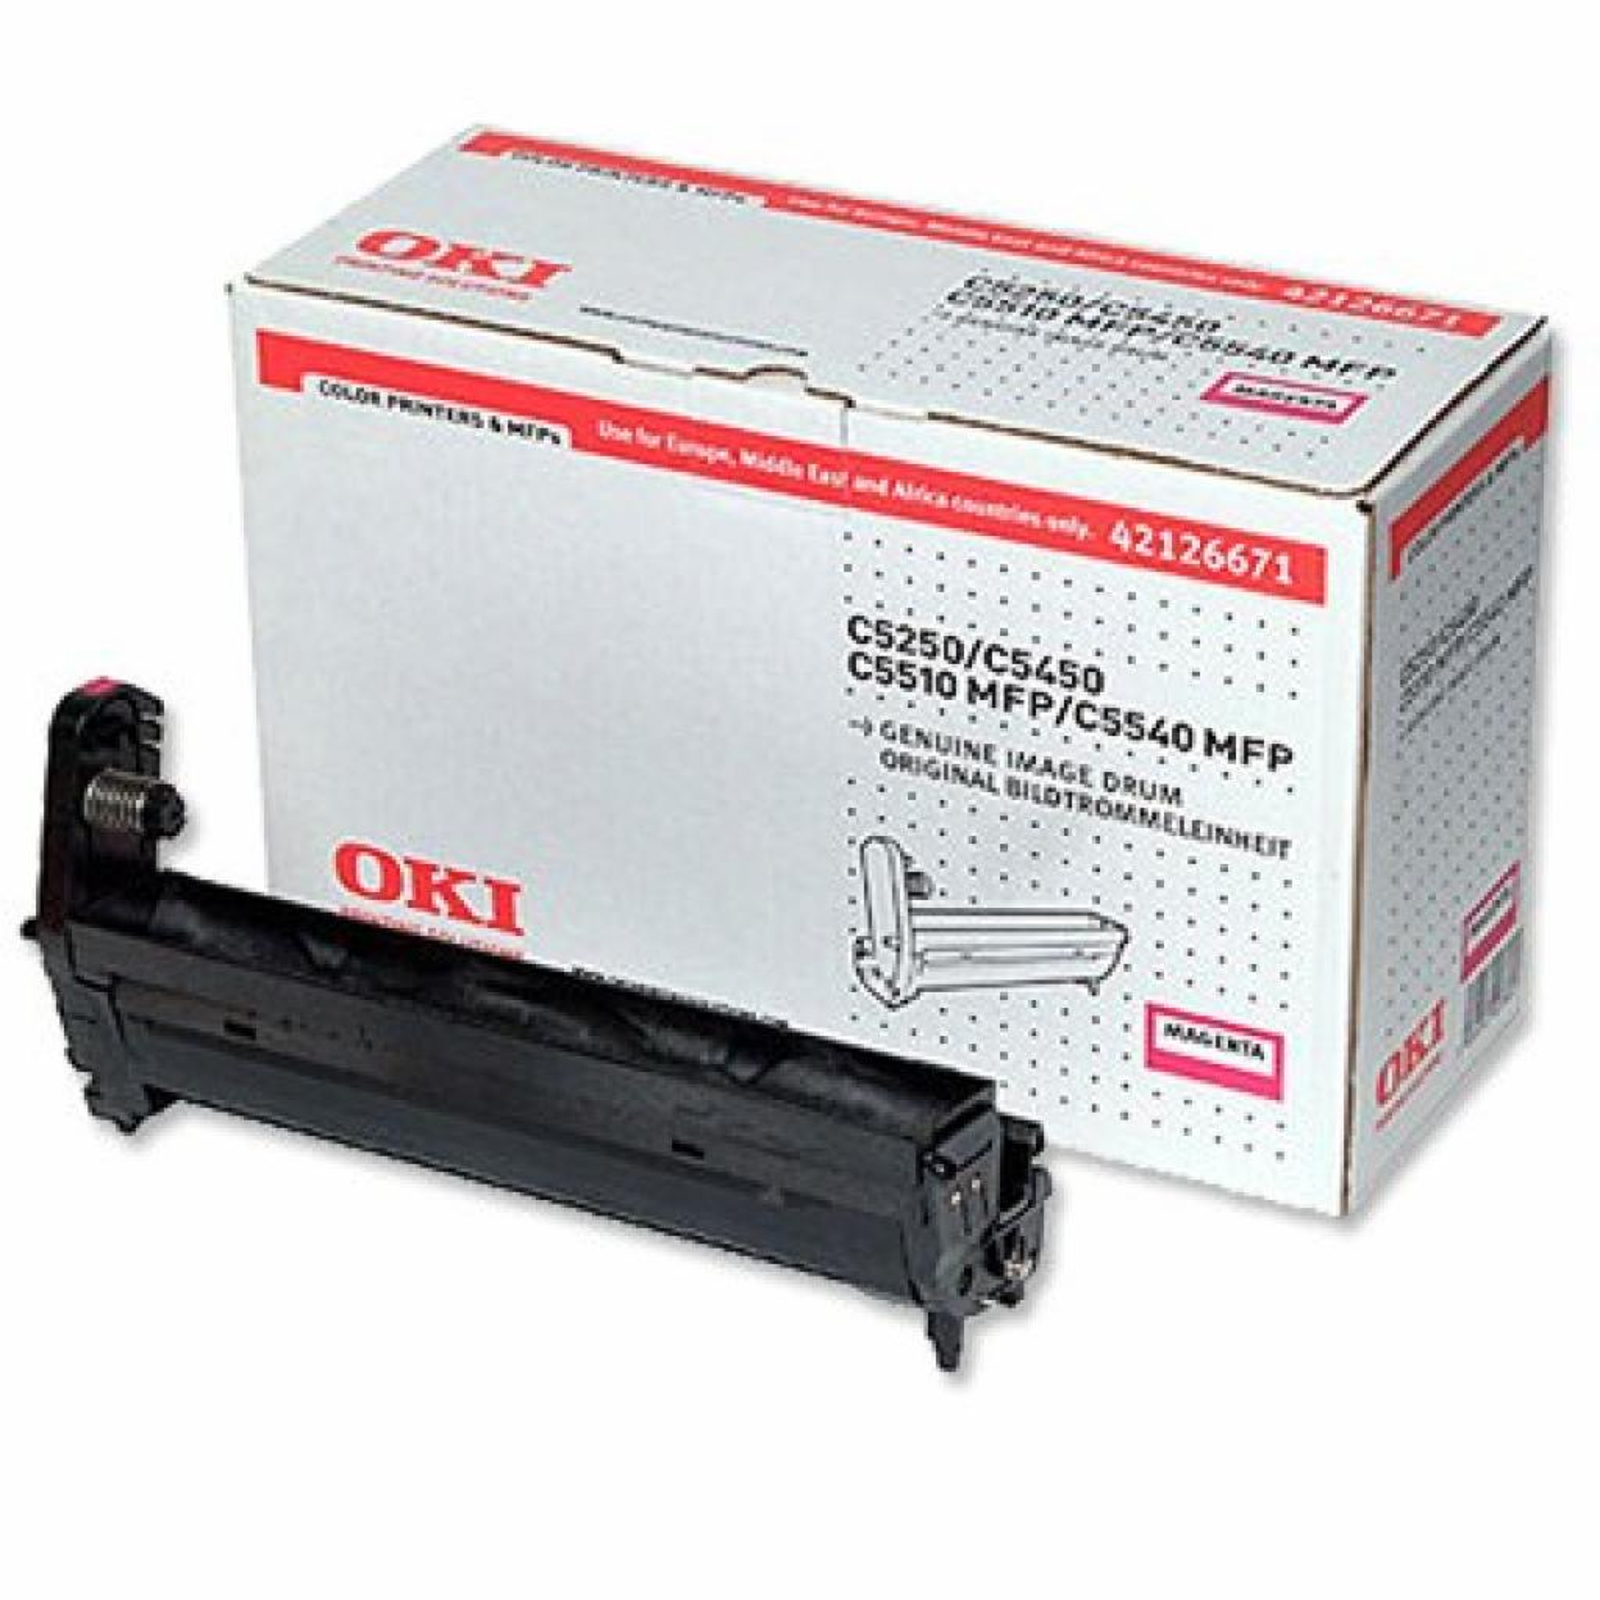 Фотокондуктор OKI C5250/5450/5510MFP/5540MFP Magenta (42126671)